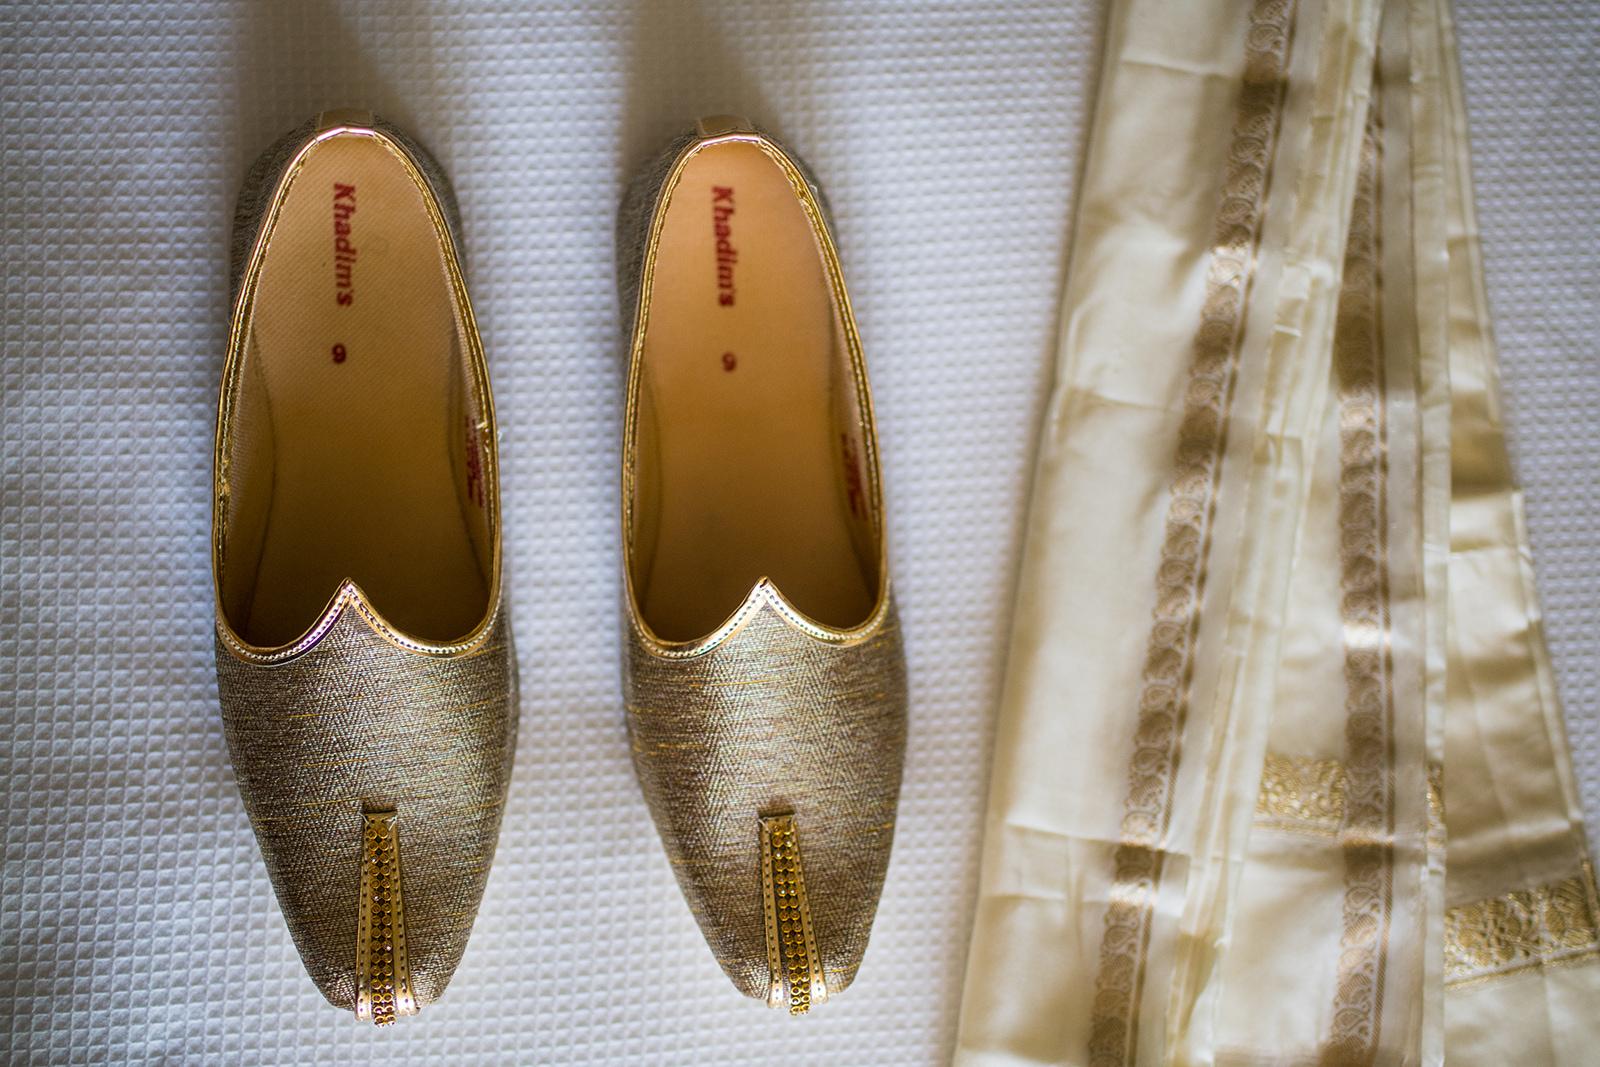 Le Cape Weddings - South Asian Wedding - Ishani and Sidhart - Groom-1.jpg